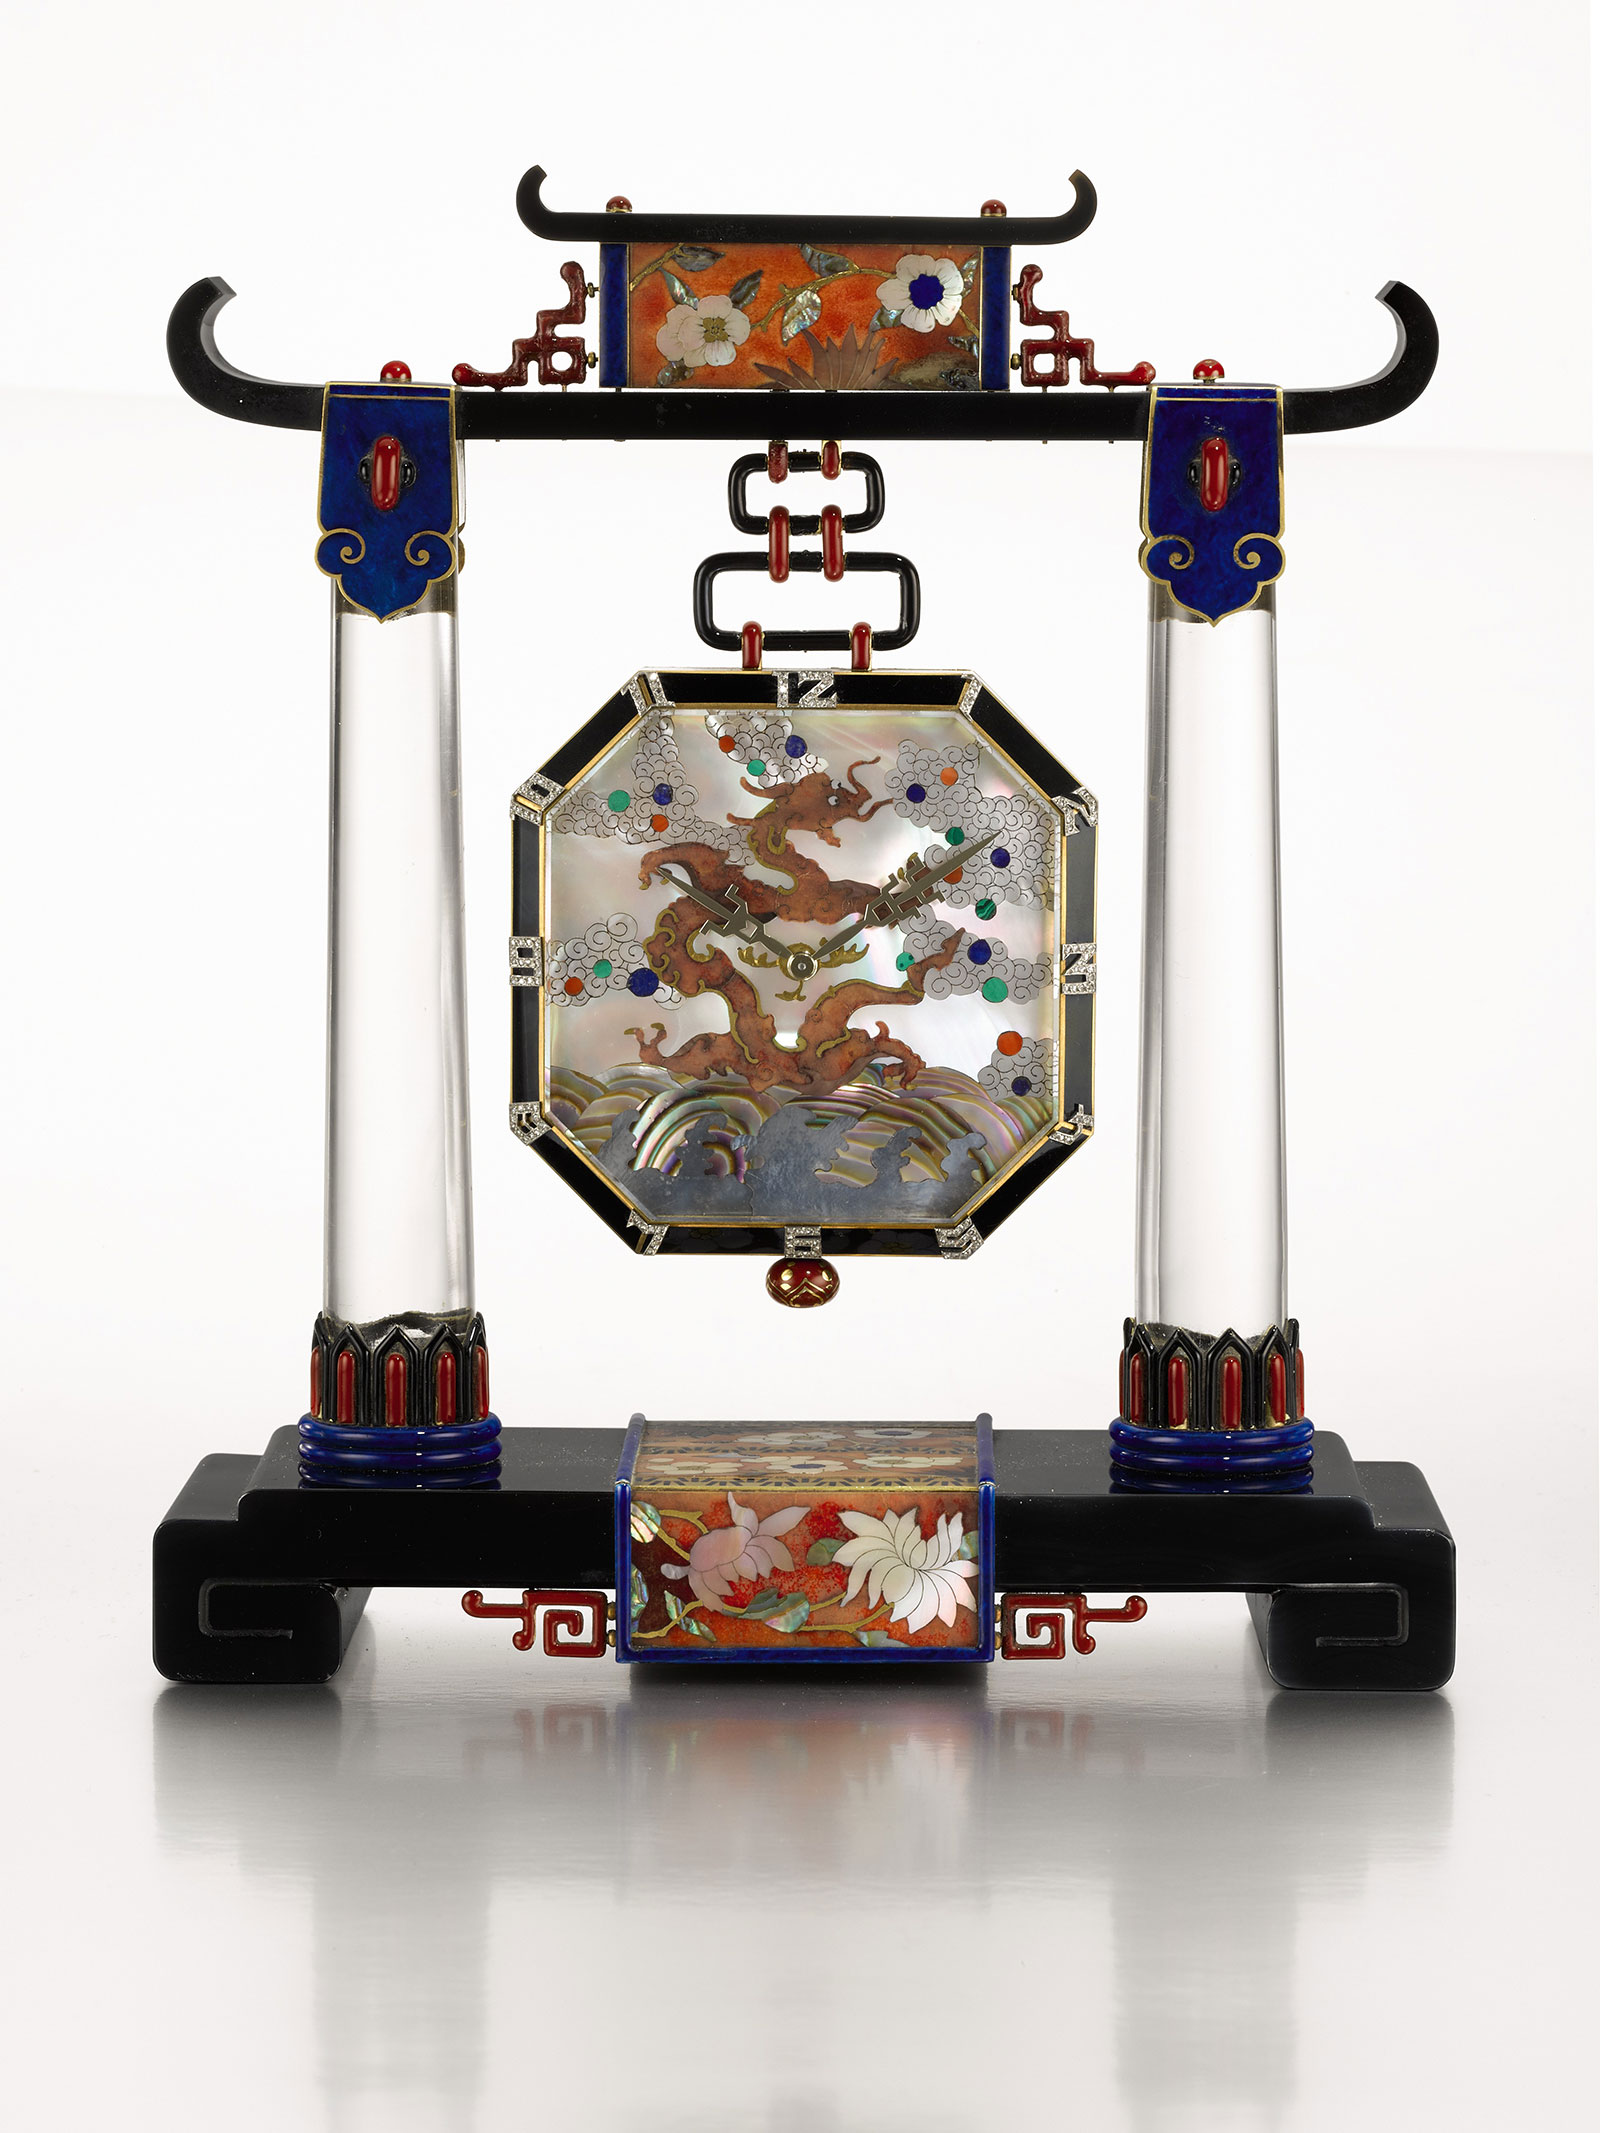 vacheron portico clock Linzeler Marchak sothebys